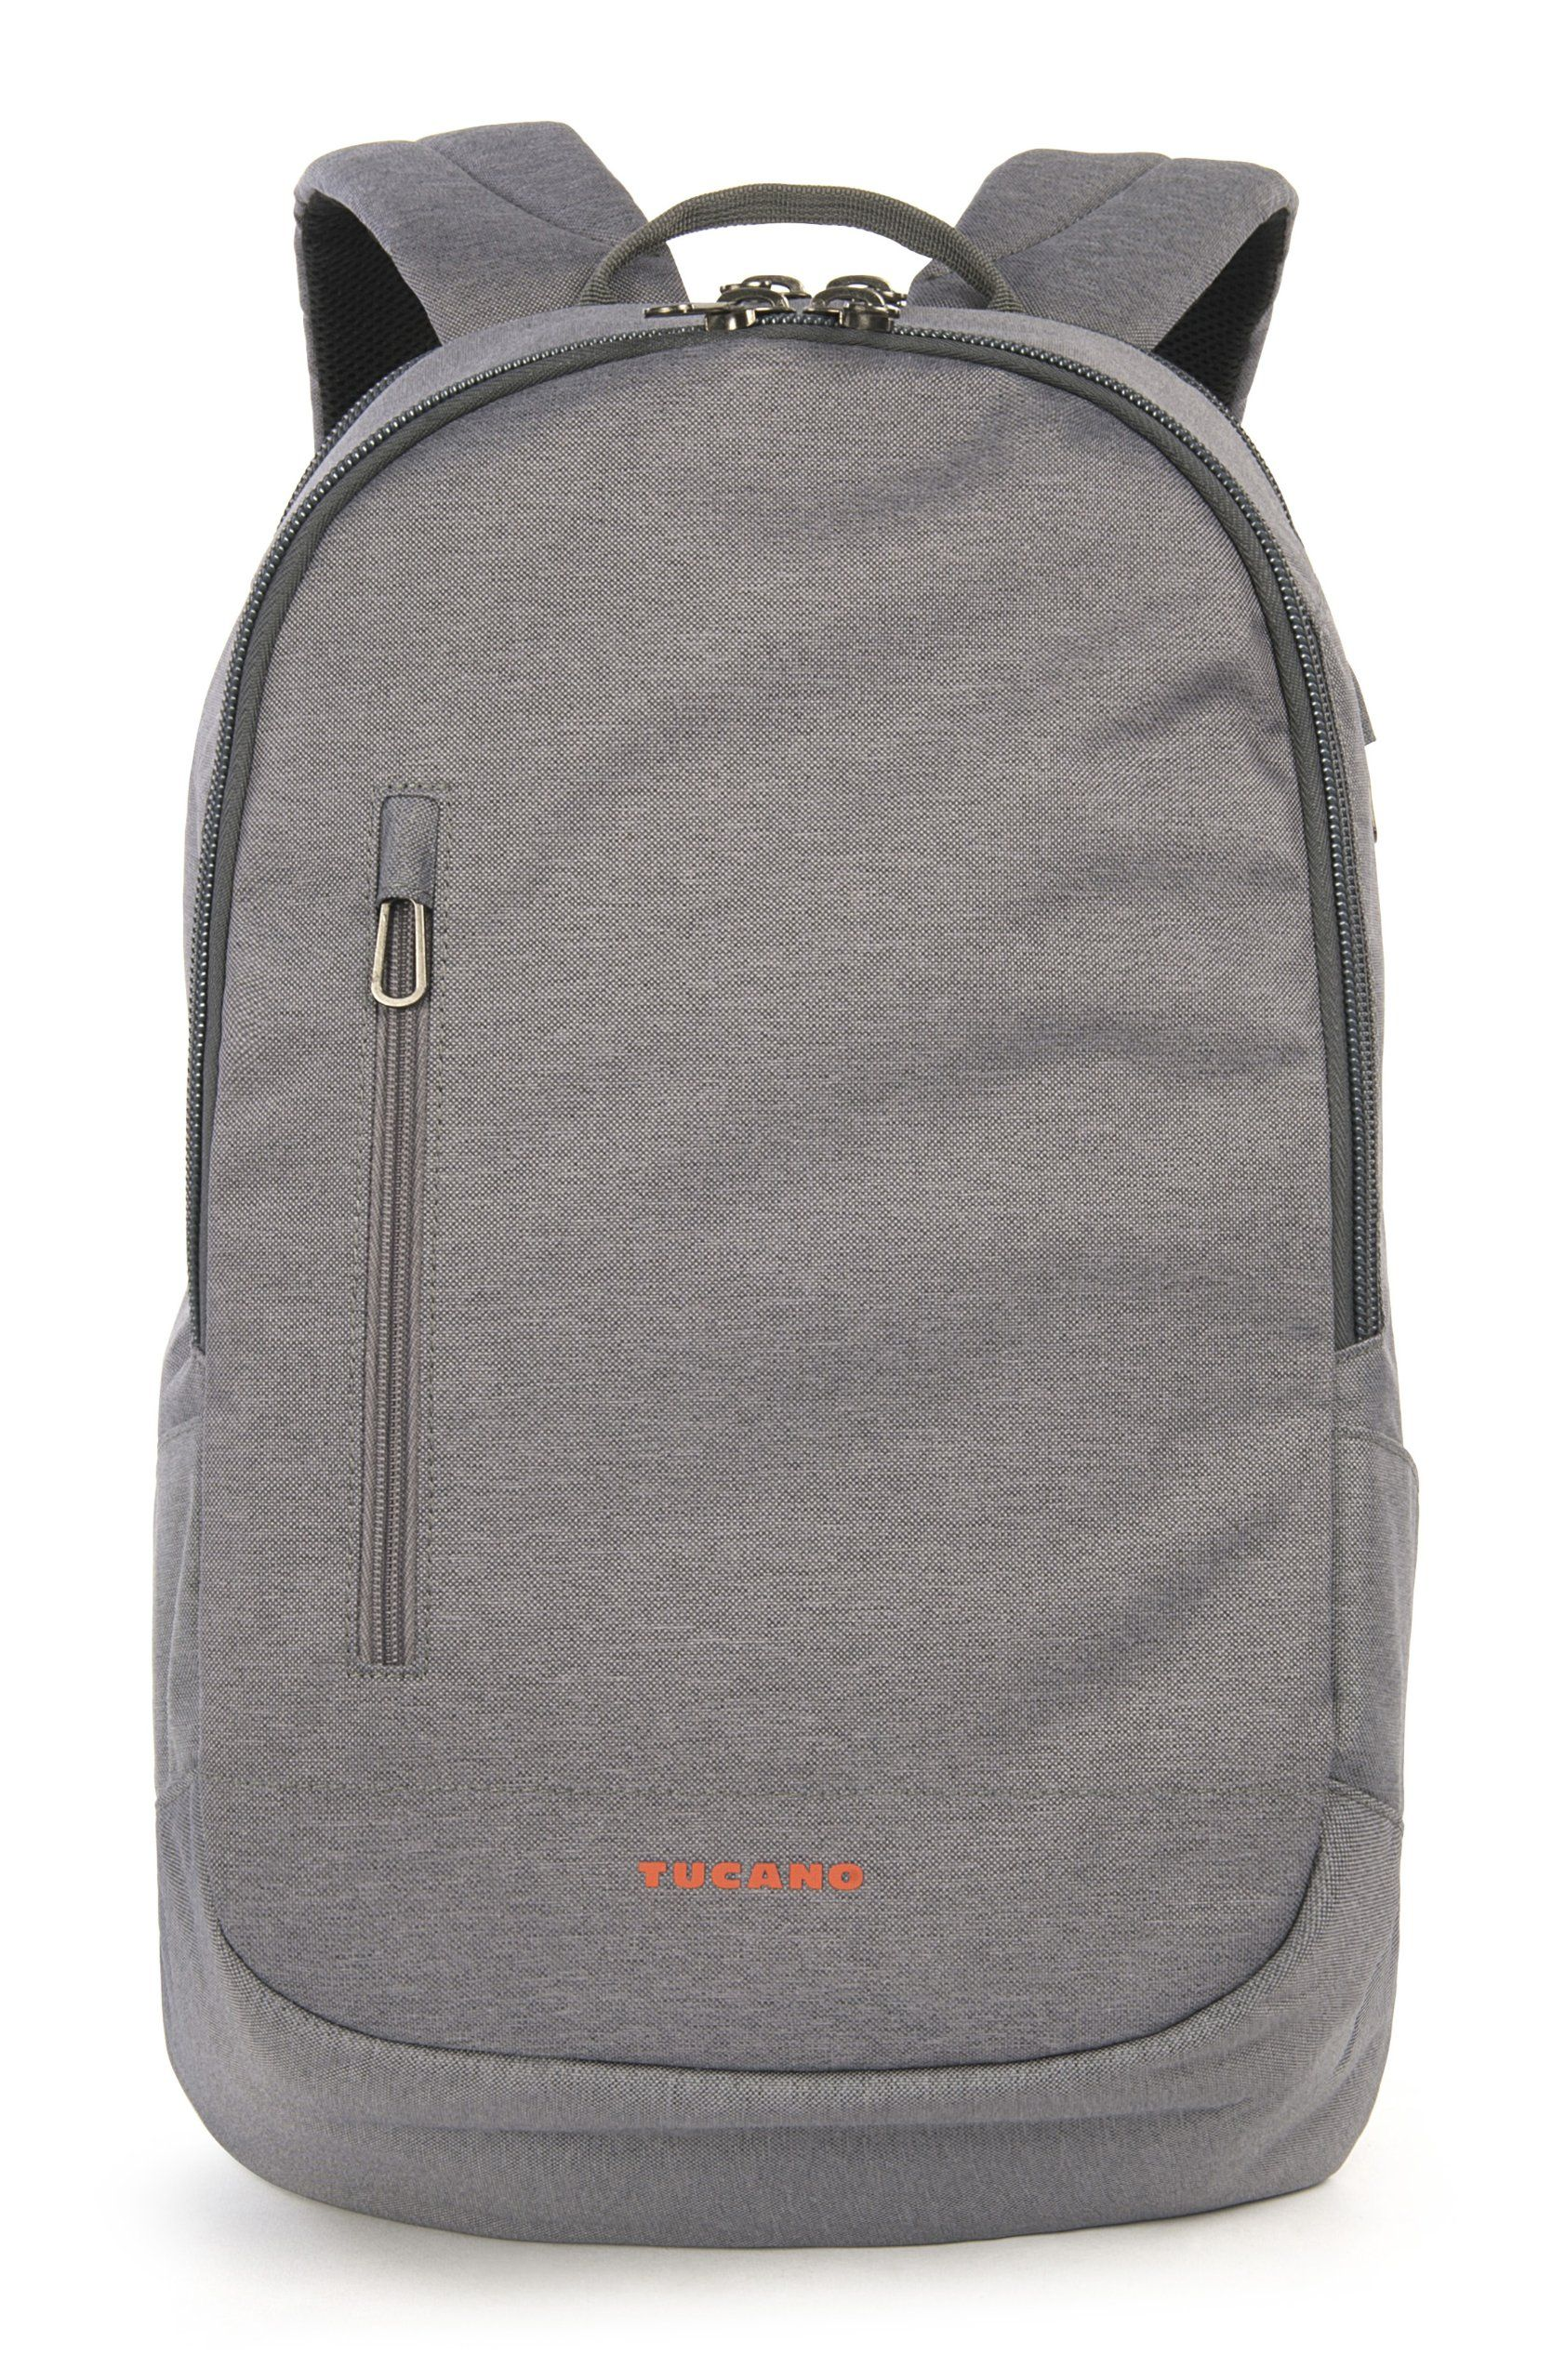 Tucano Magnum backpack for MacBook Pro 15